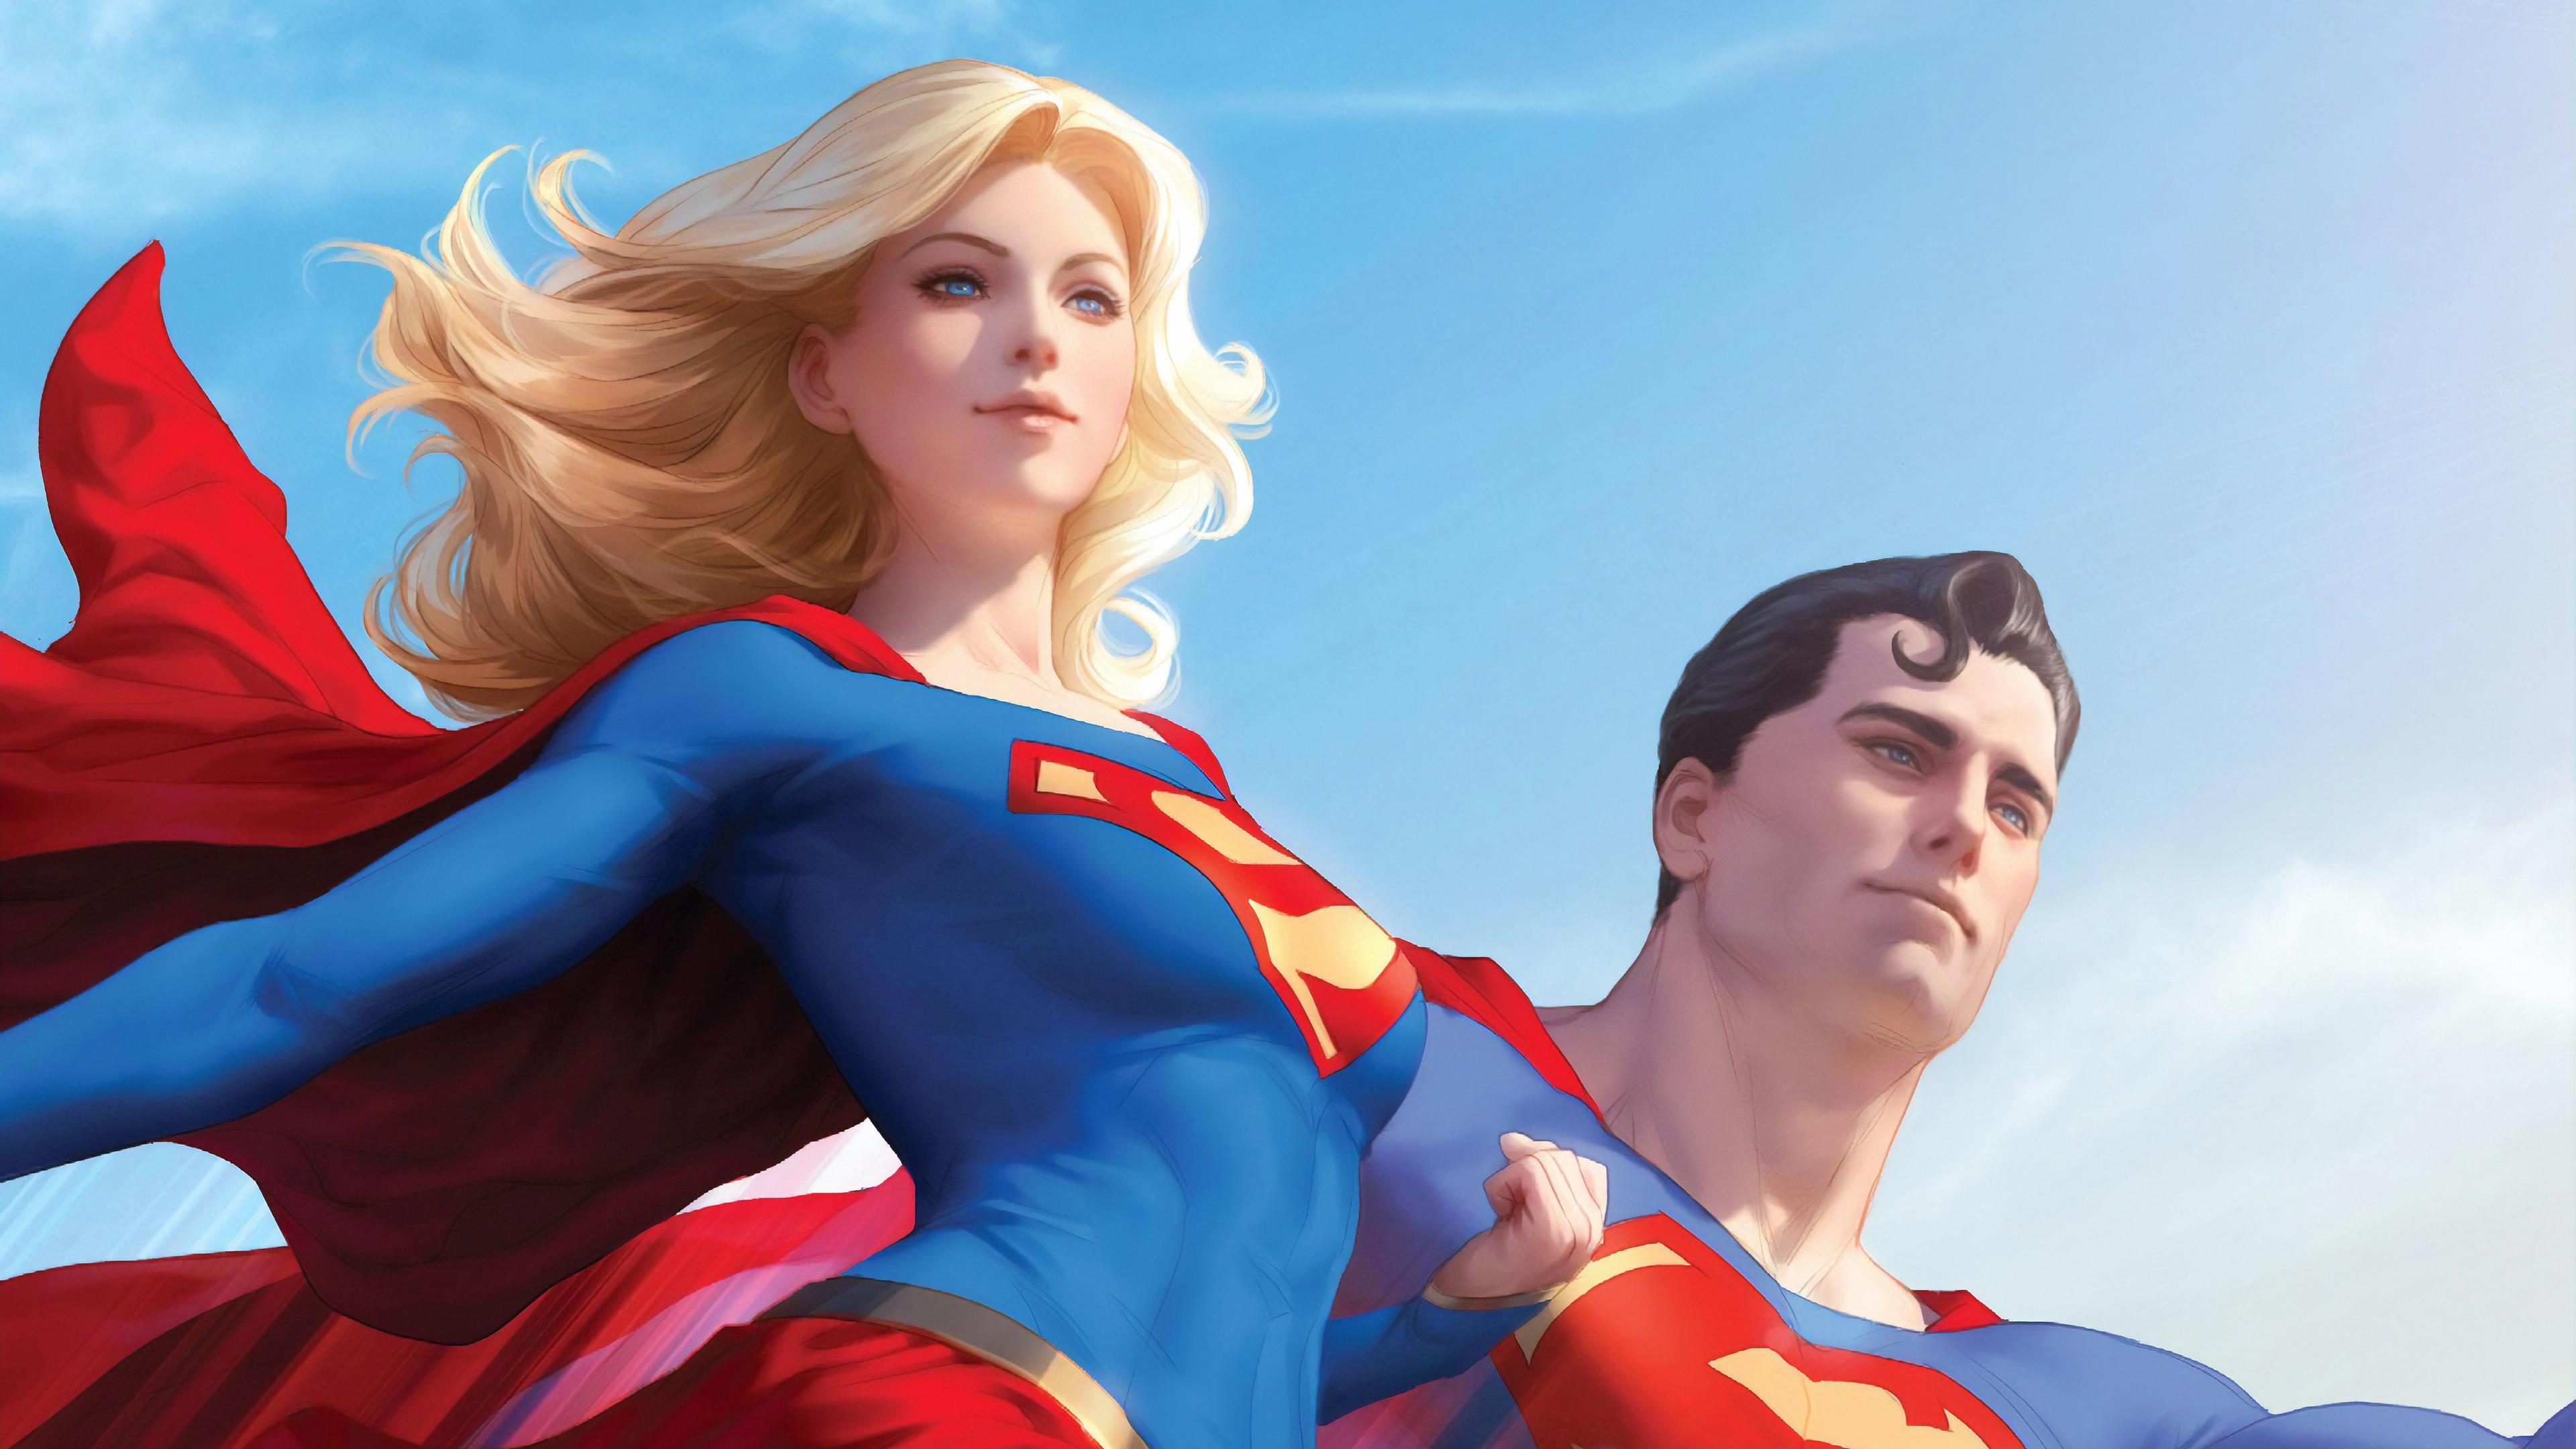 superman and supergirl 1569186756 - Superman And Supergirl - superman wallpapers, superheroes wallpapers, supergirl wallpapers, hd-wallpapers, artwork wallpapers, 4k-wallpapers